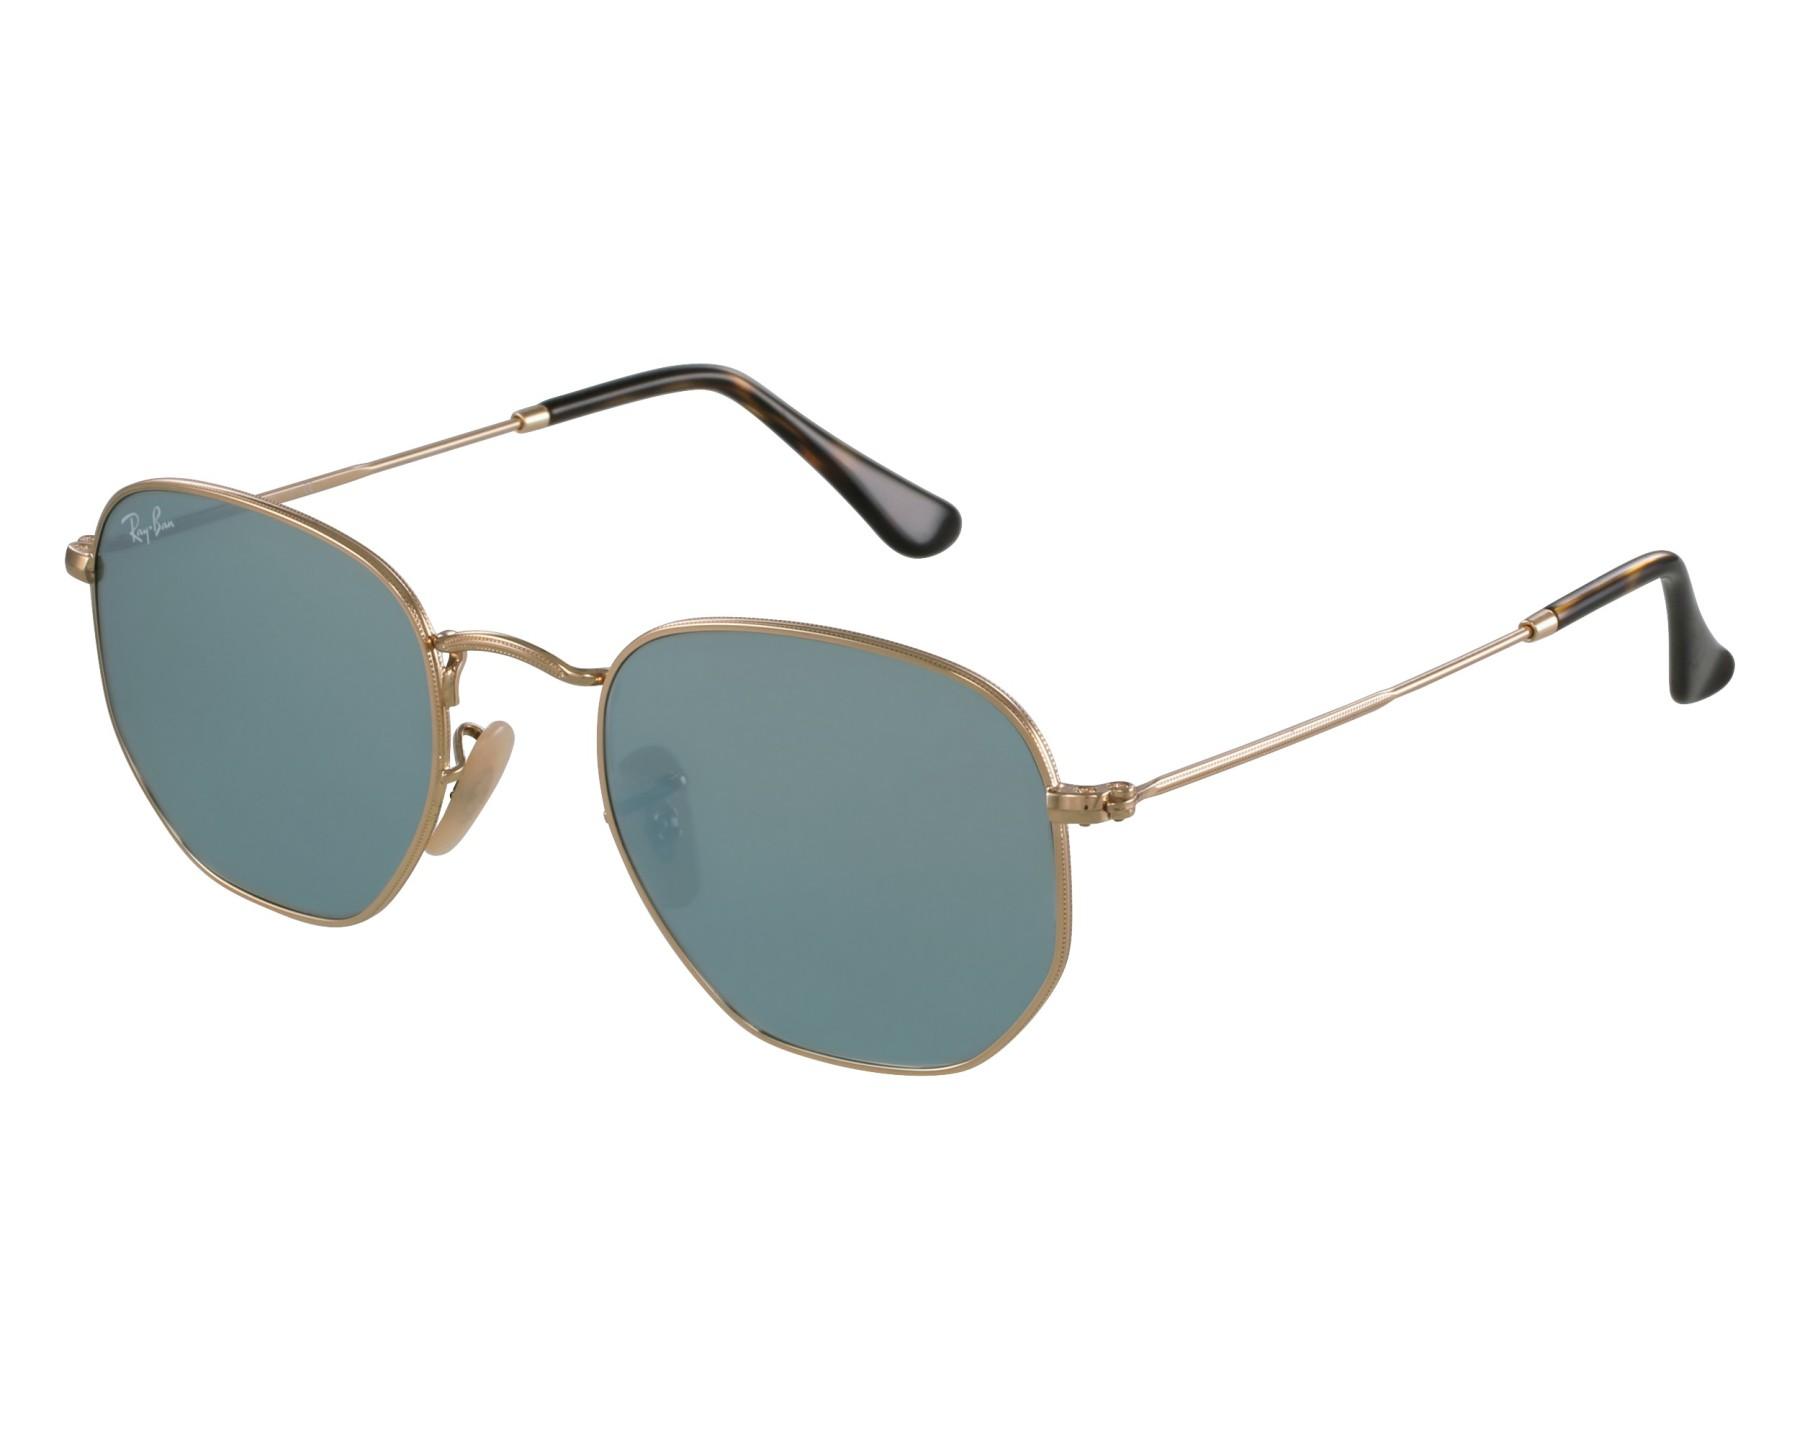 d68380c6ea6 Ray-Ban Sunglasses Hexagonal Flat Lenses RB-3548-N 001 30